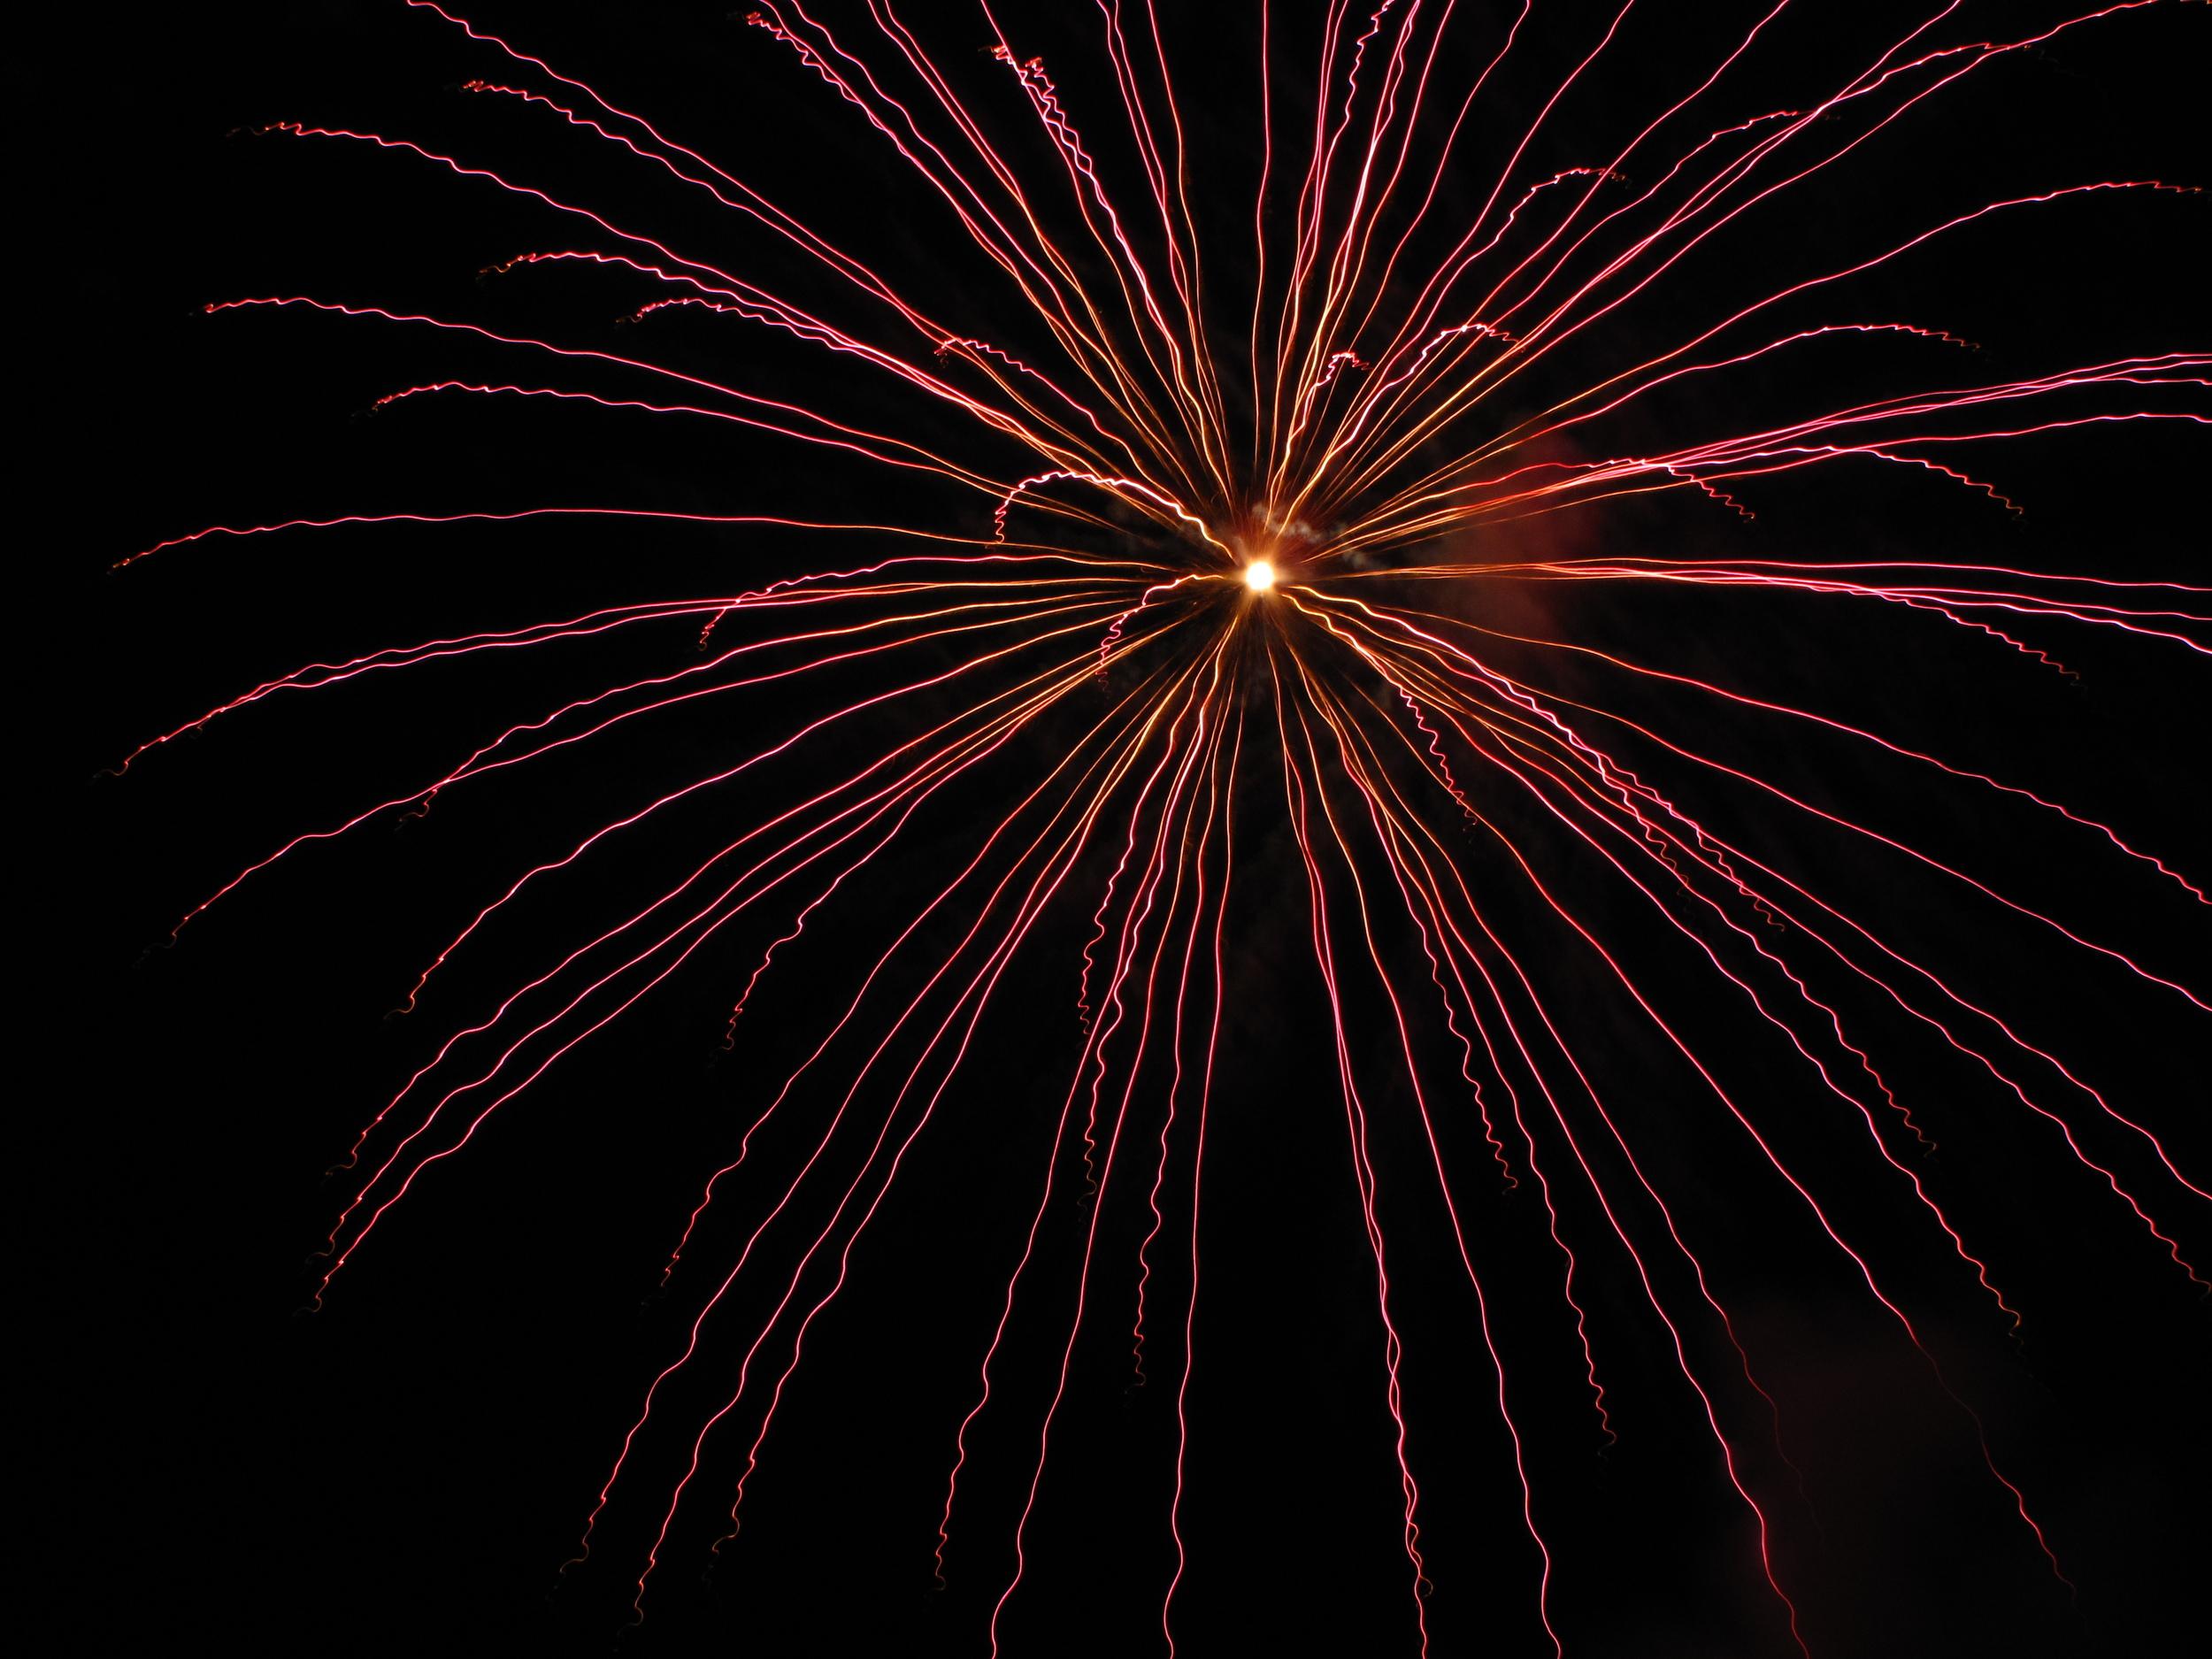 Fireworks in Les Eyzies de Tayac